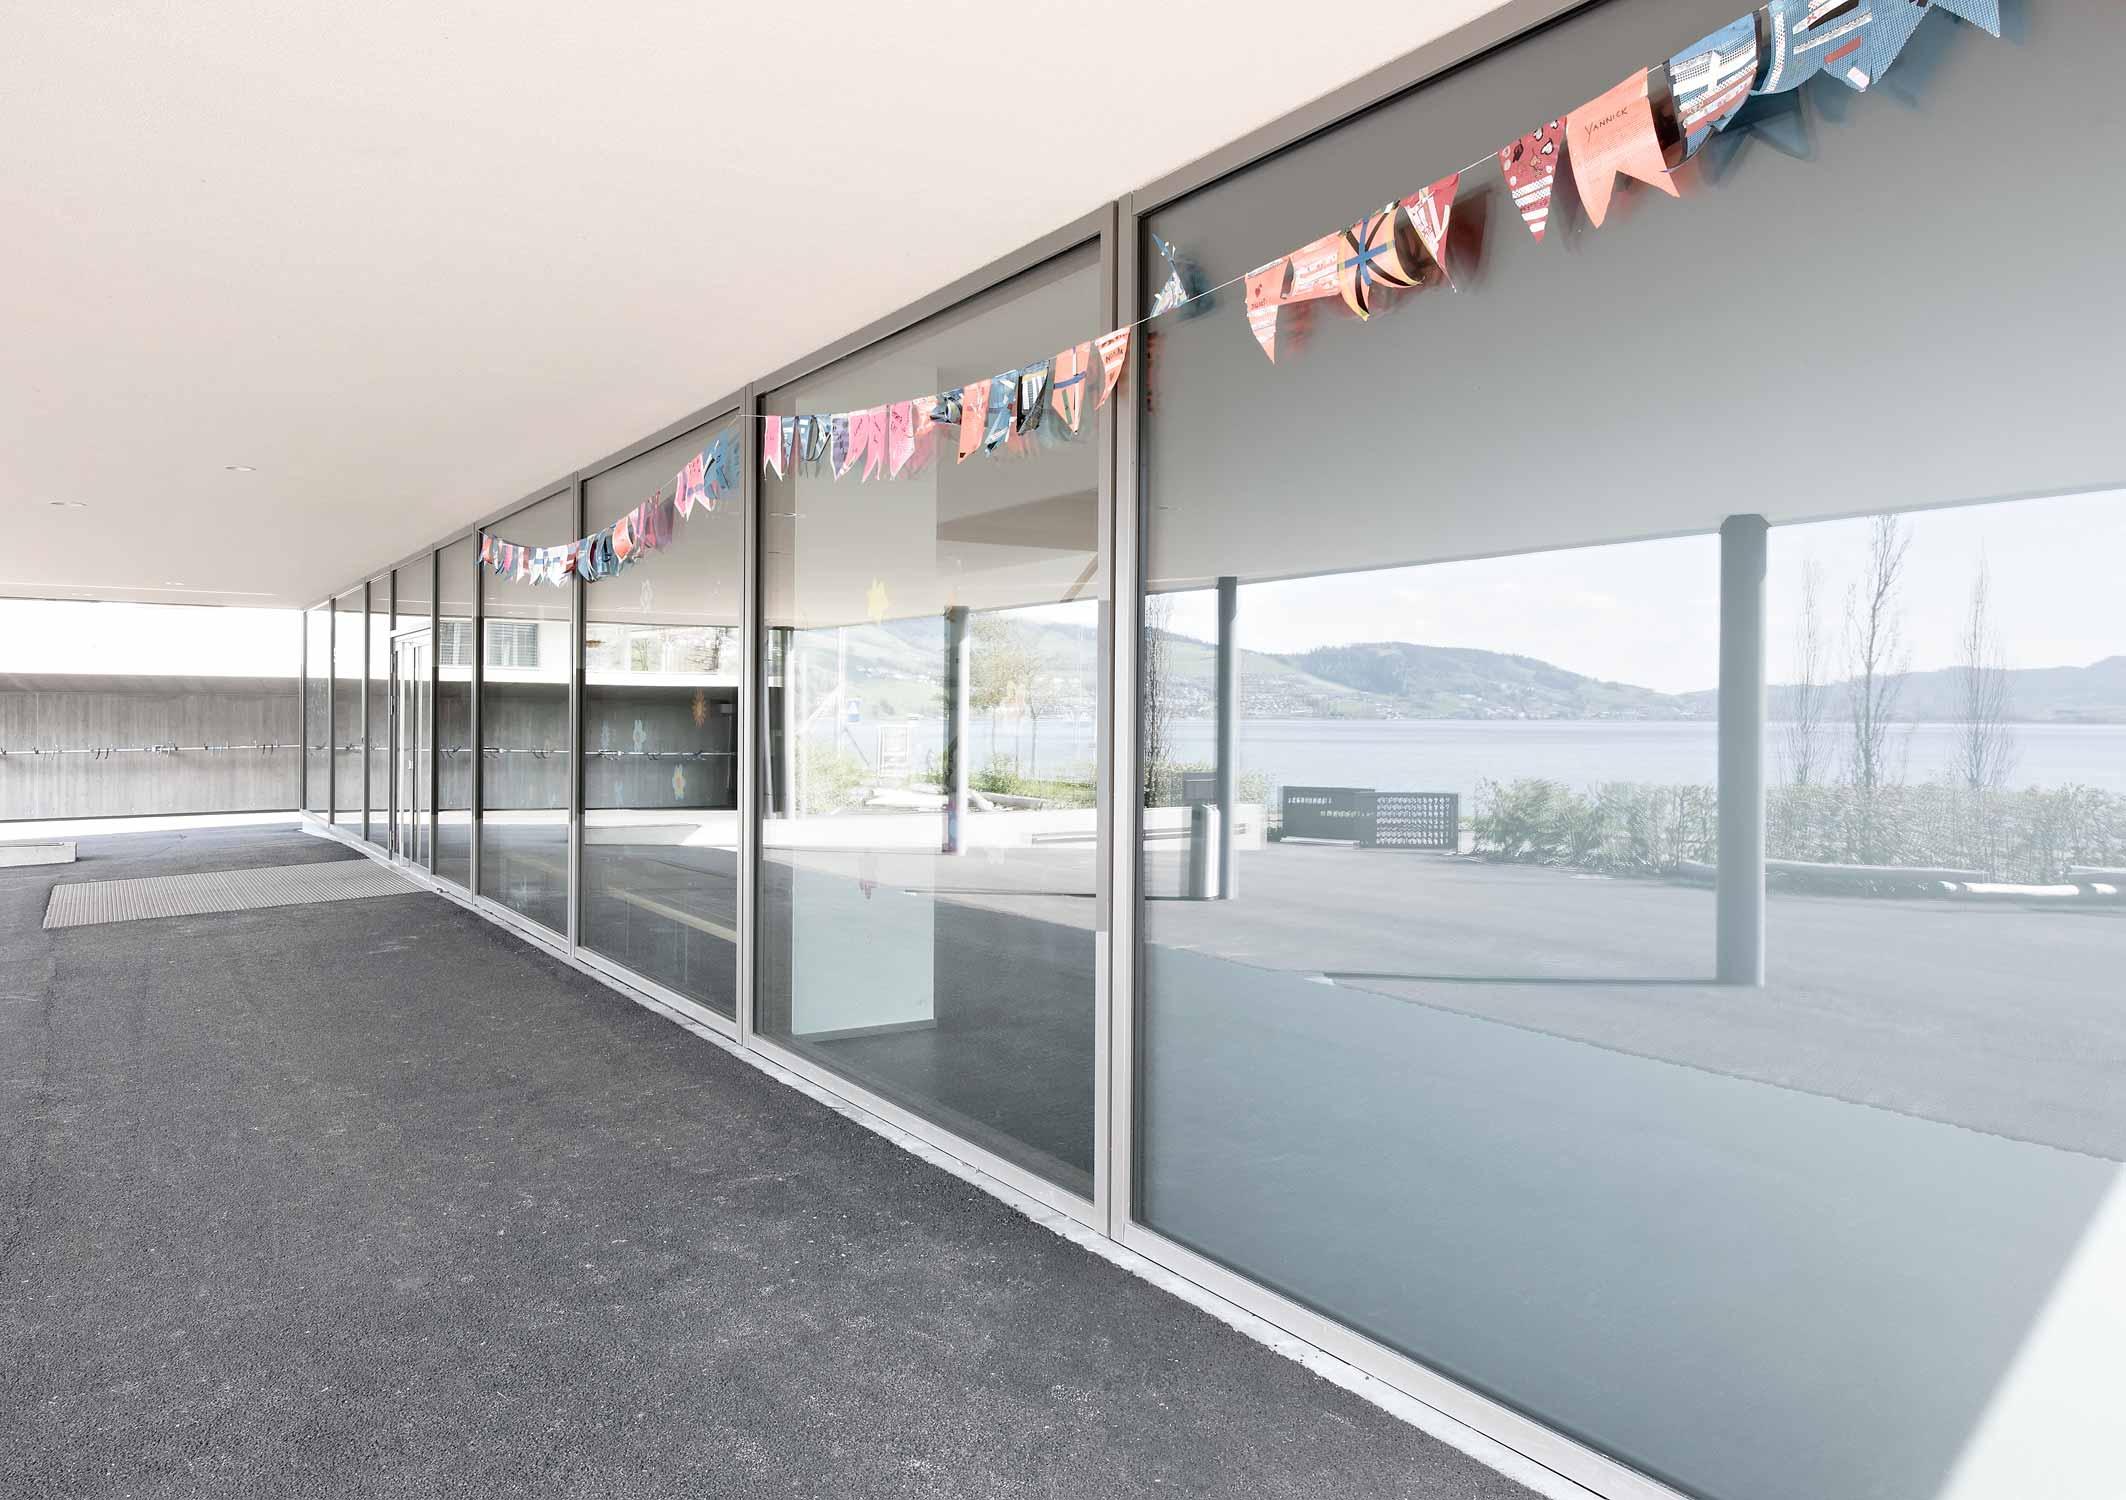 Glasfront am Eingang des Schulhauses Morgarten